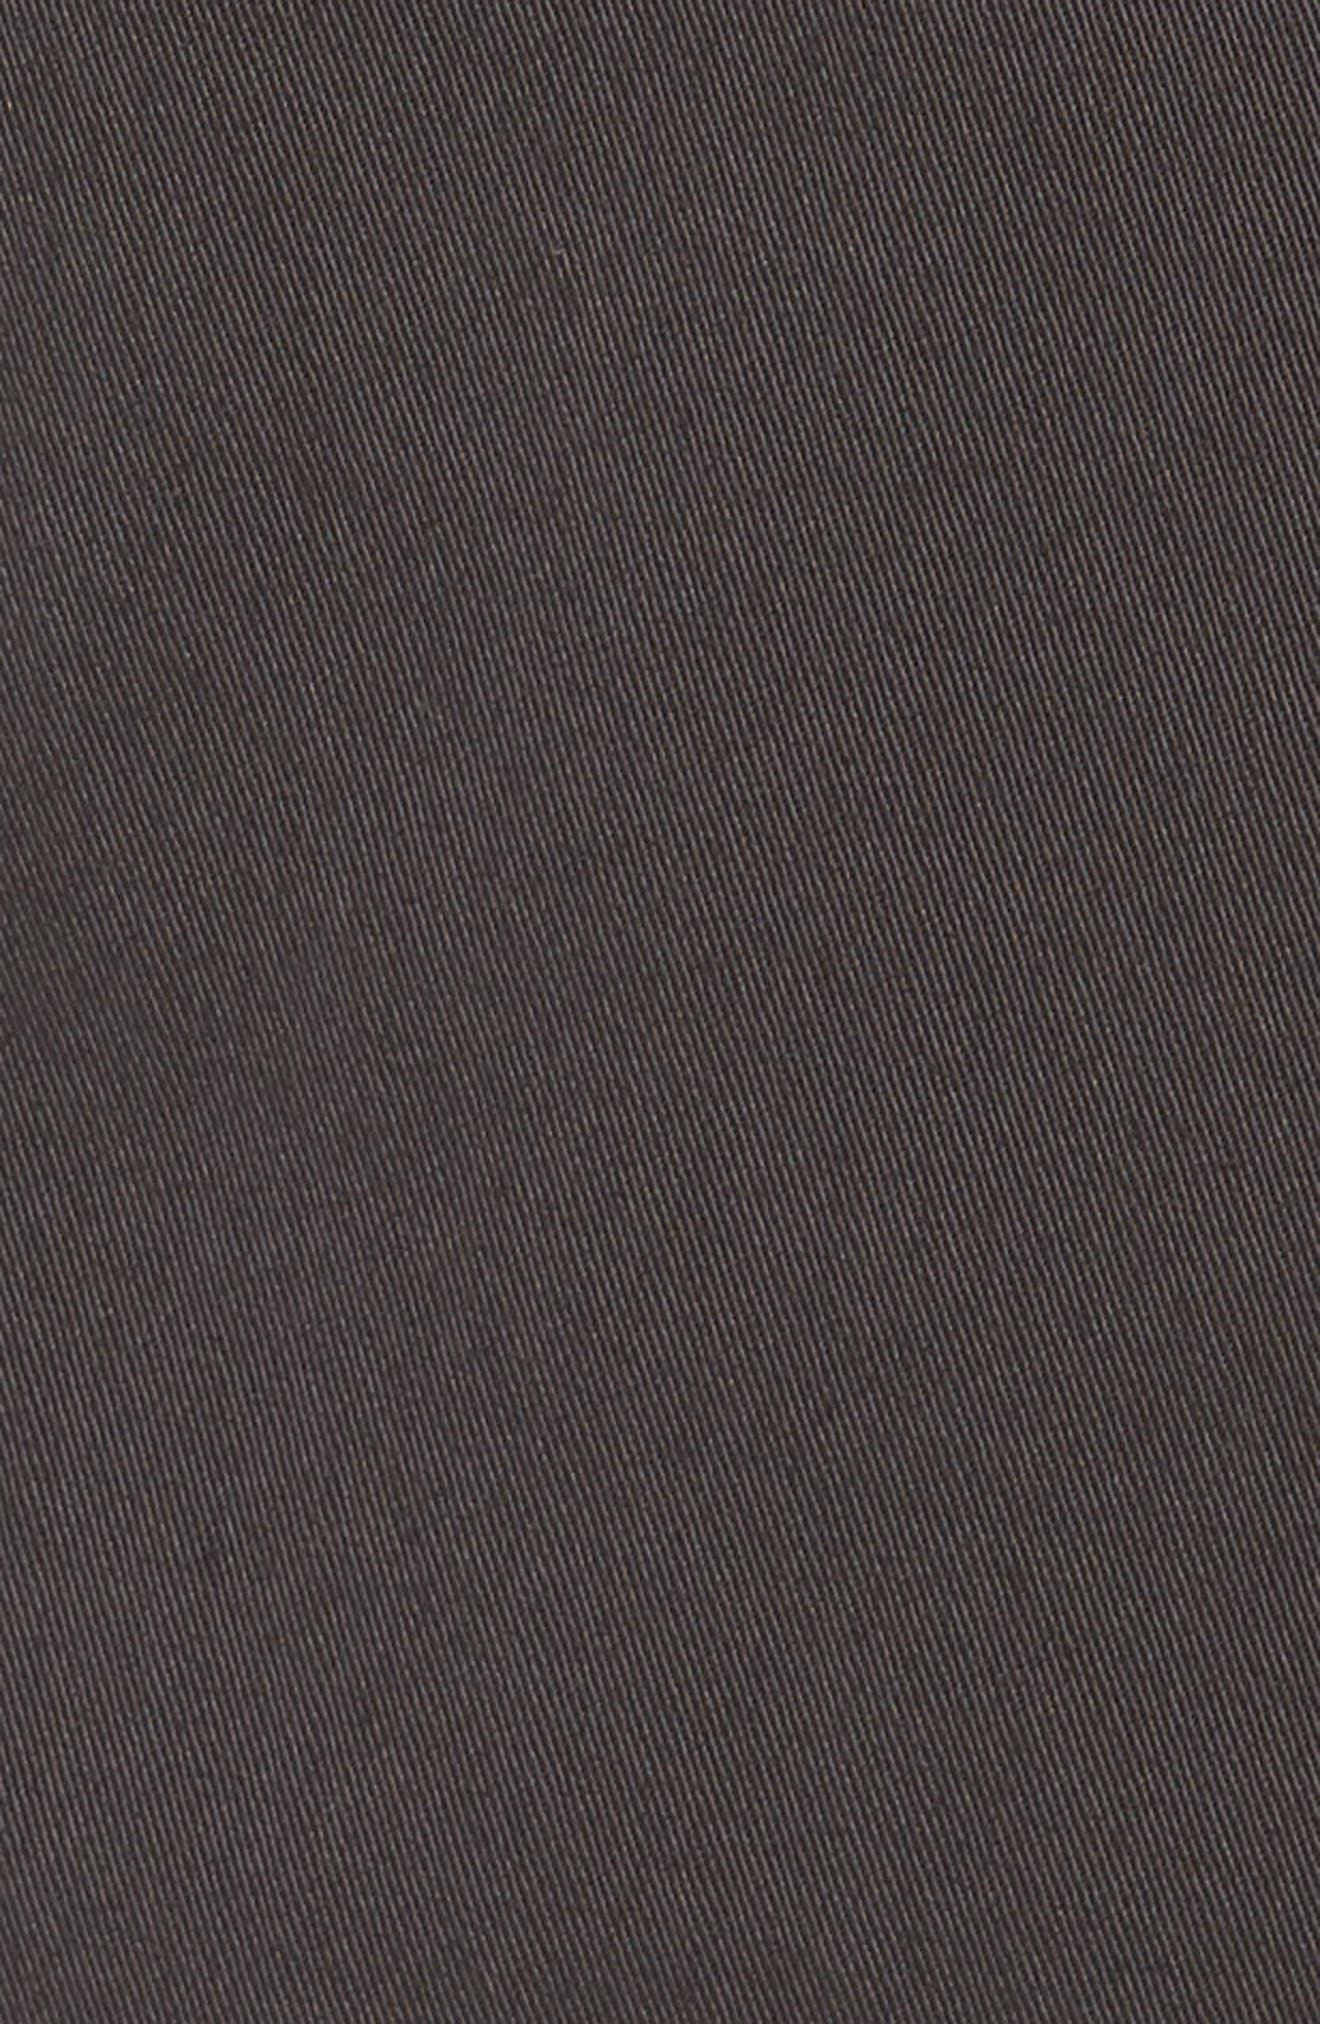 St. Barts Twill Shorts,                             Alternate thumbnail 50, color,